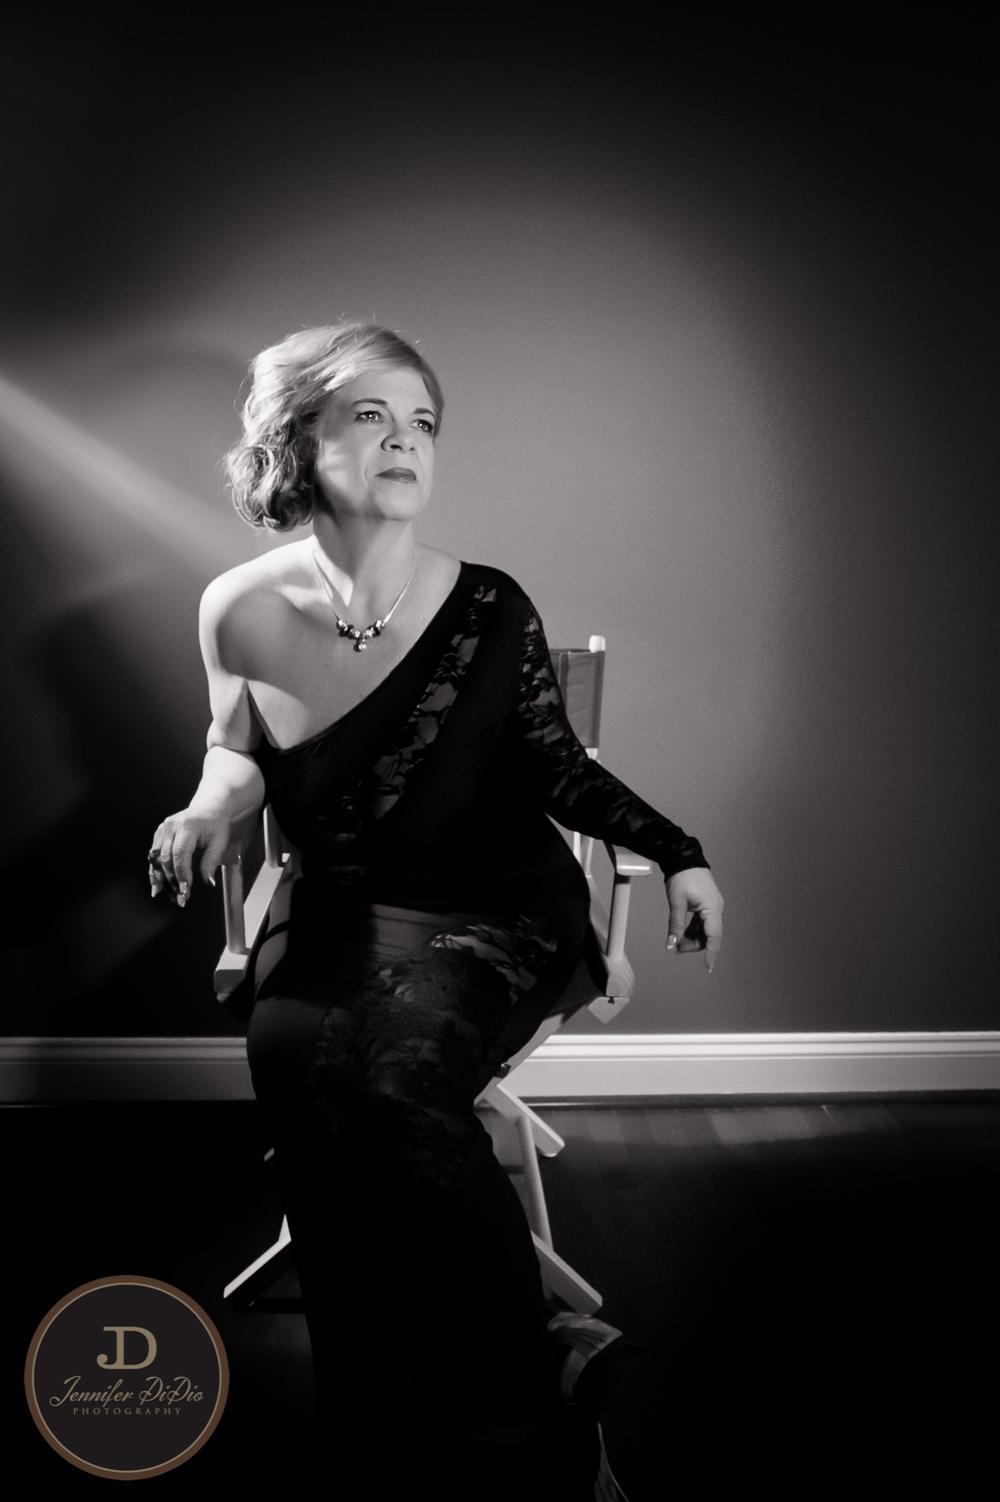 Jennifer.DiDio.Photography.Wroe.Judi.2014-228.jpg